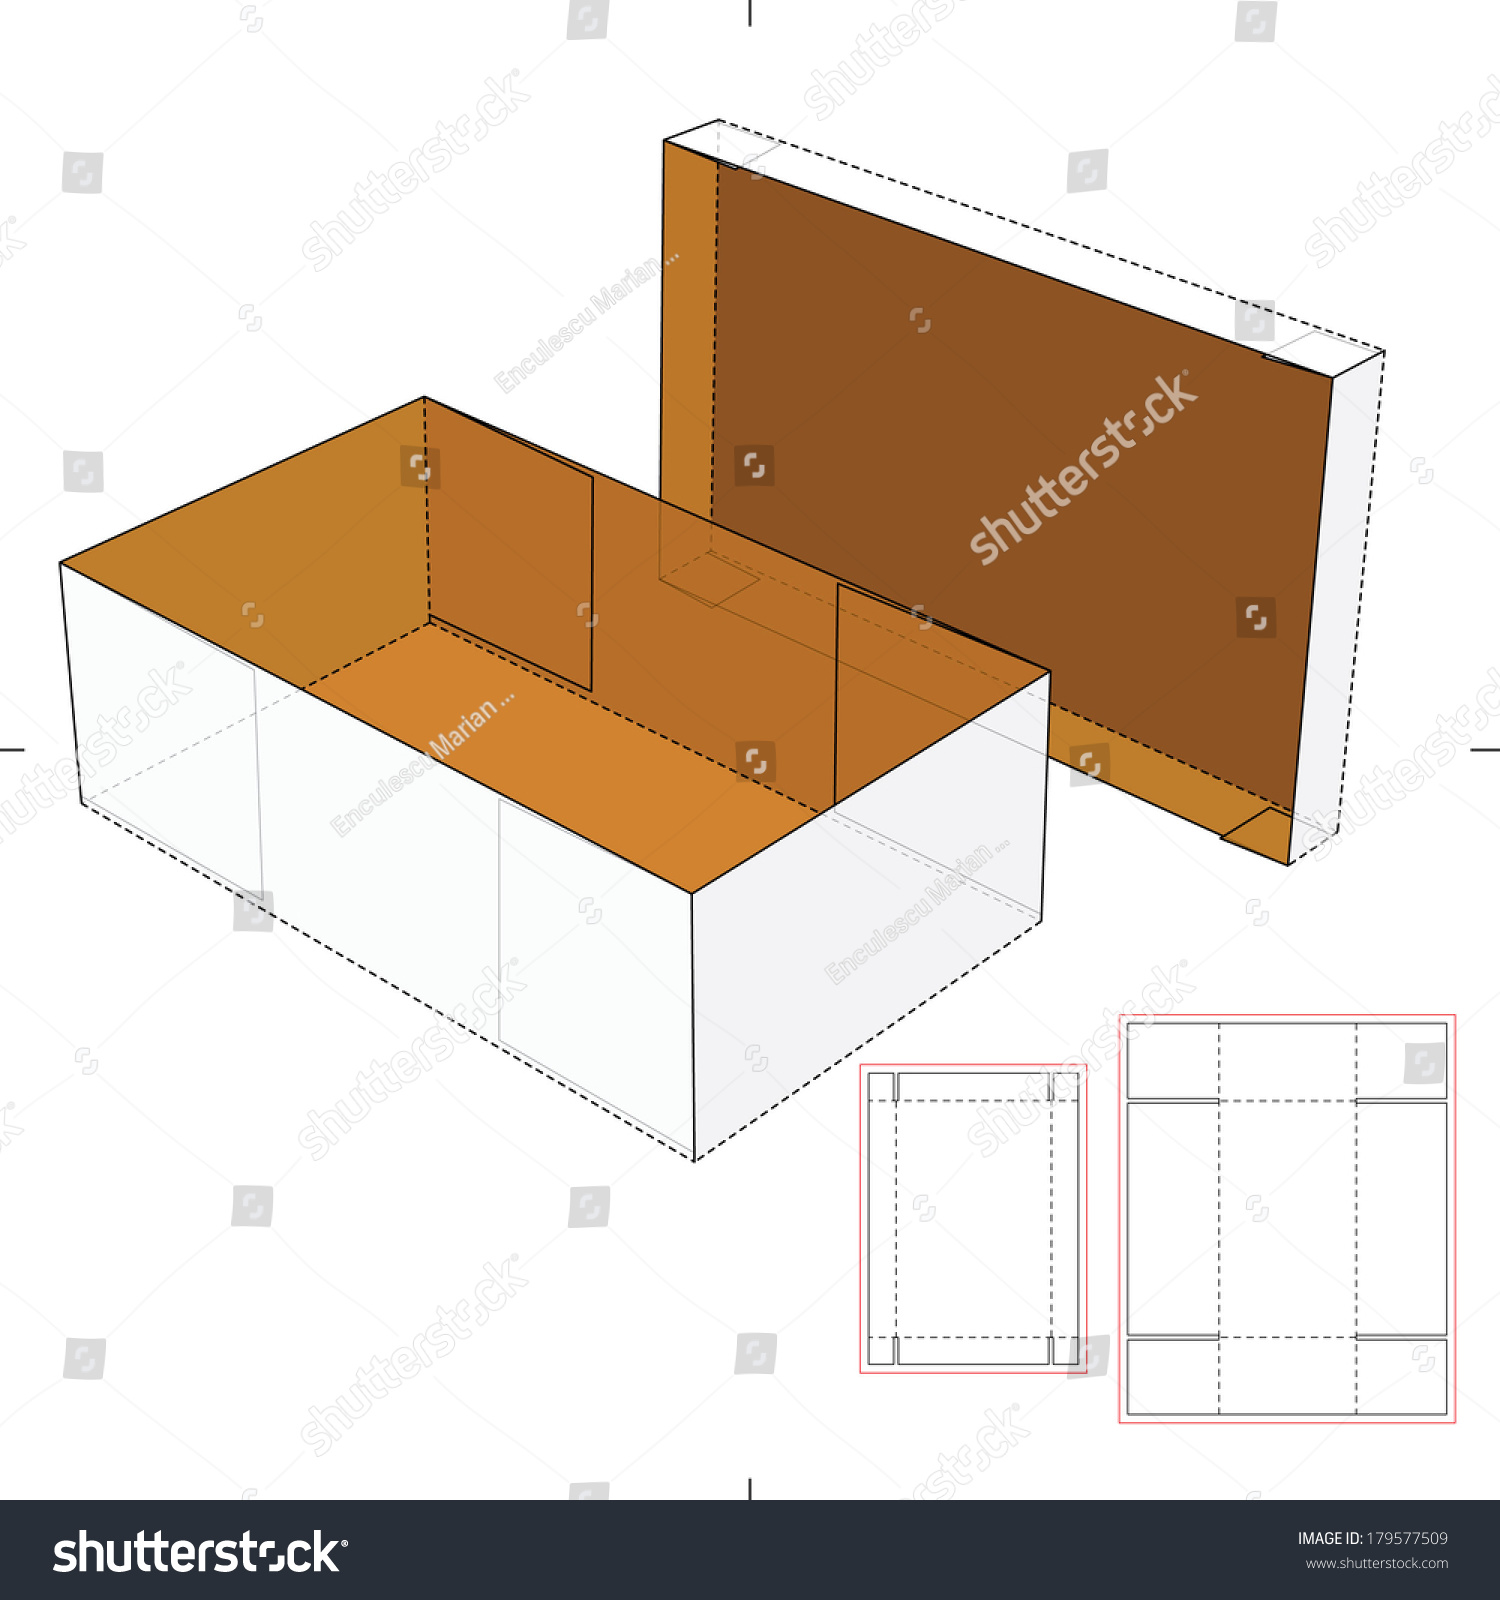 shoes cardboard box diecut pattern stock vector 179577509 shutterstock. Black Bedroom Furniture Sets. Home Design Ideas